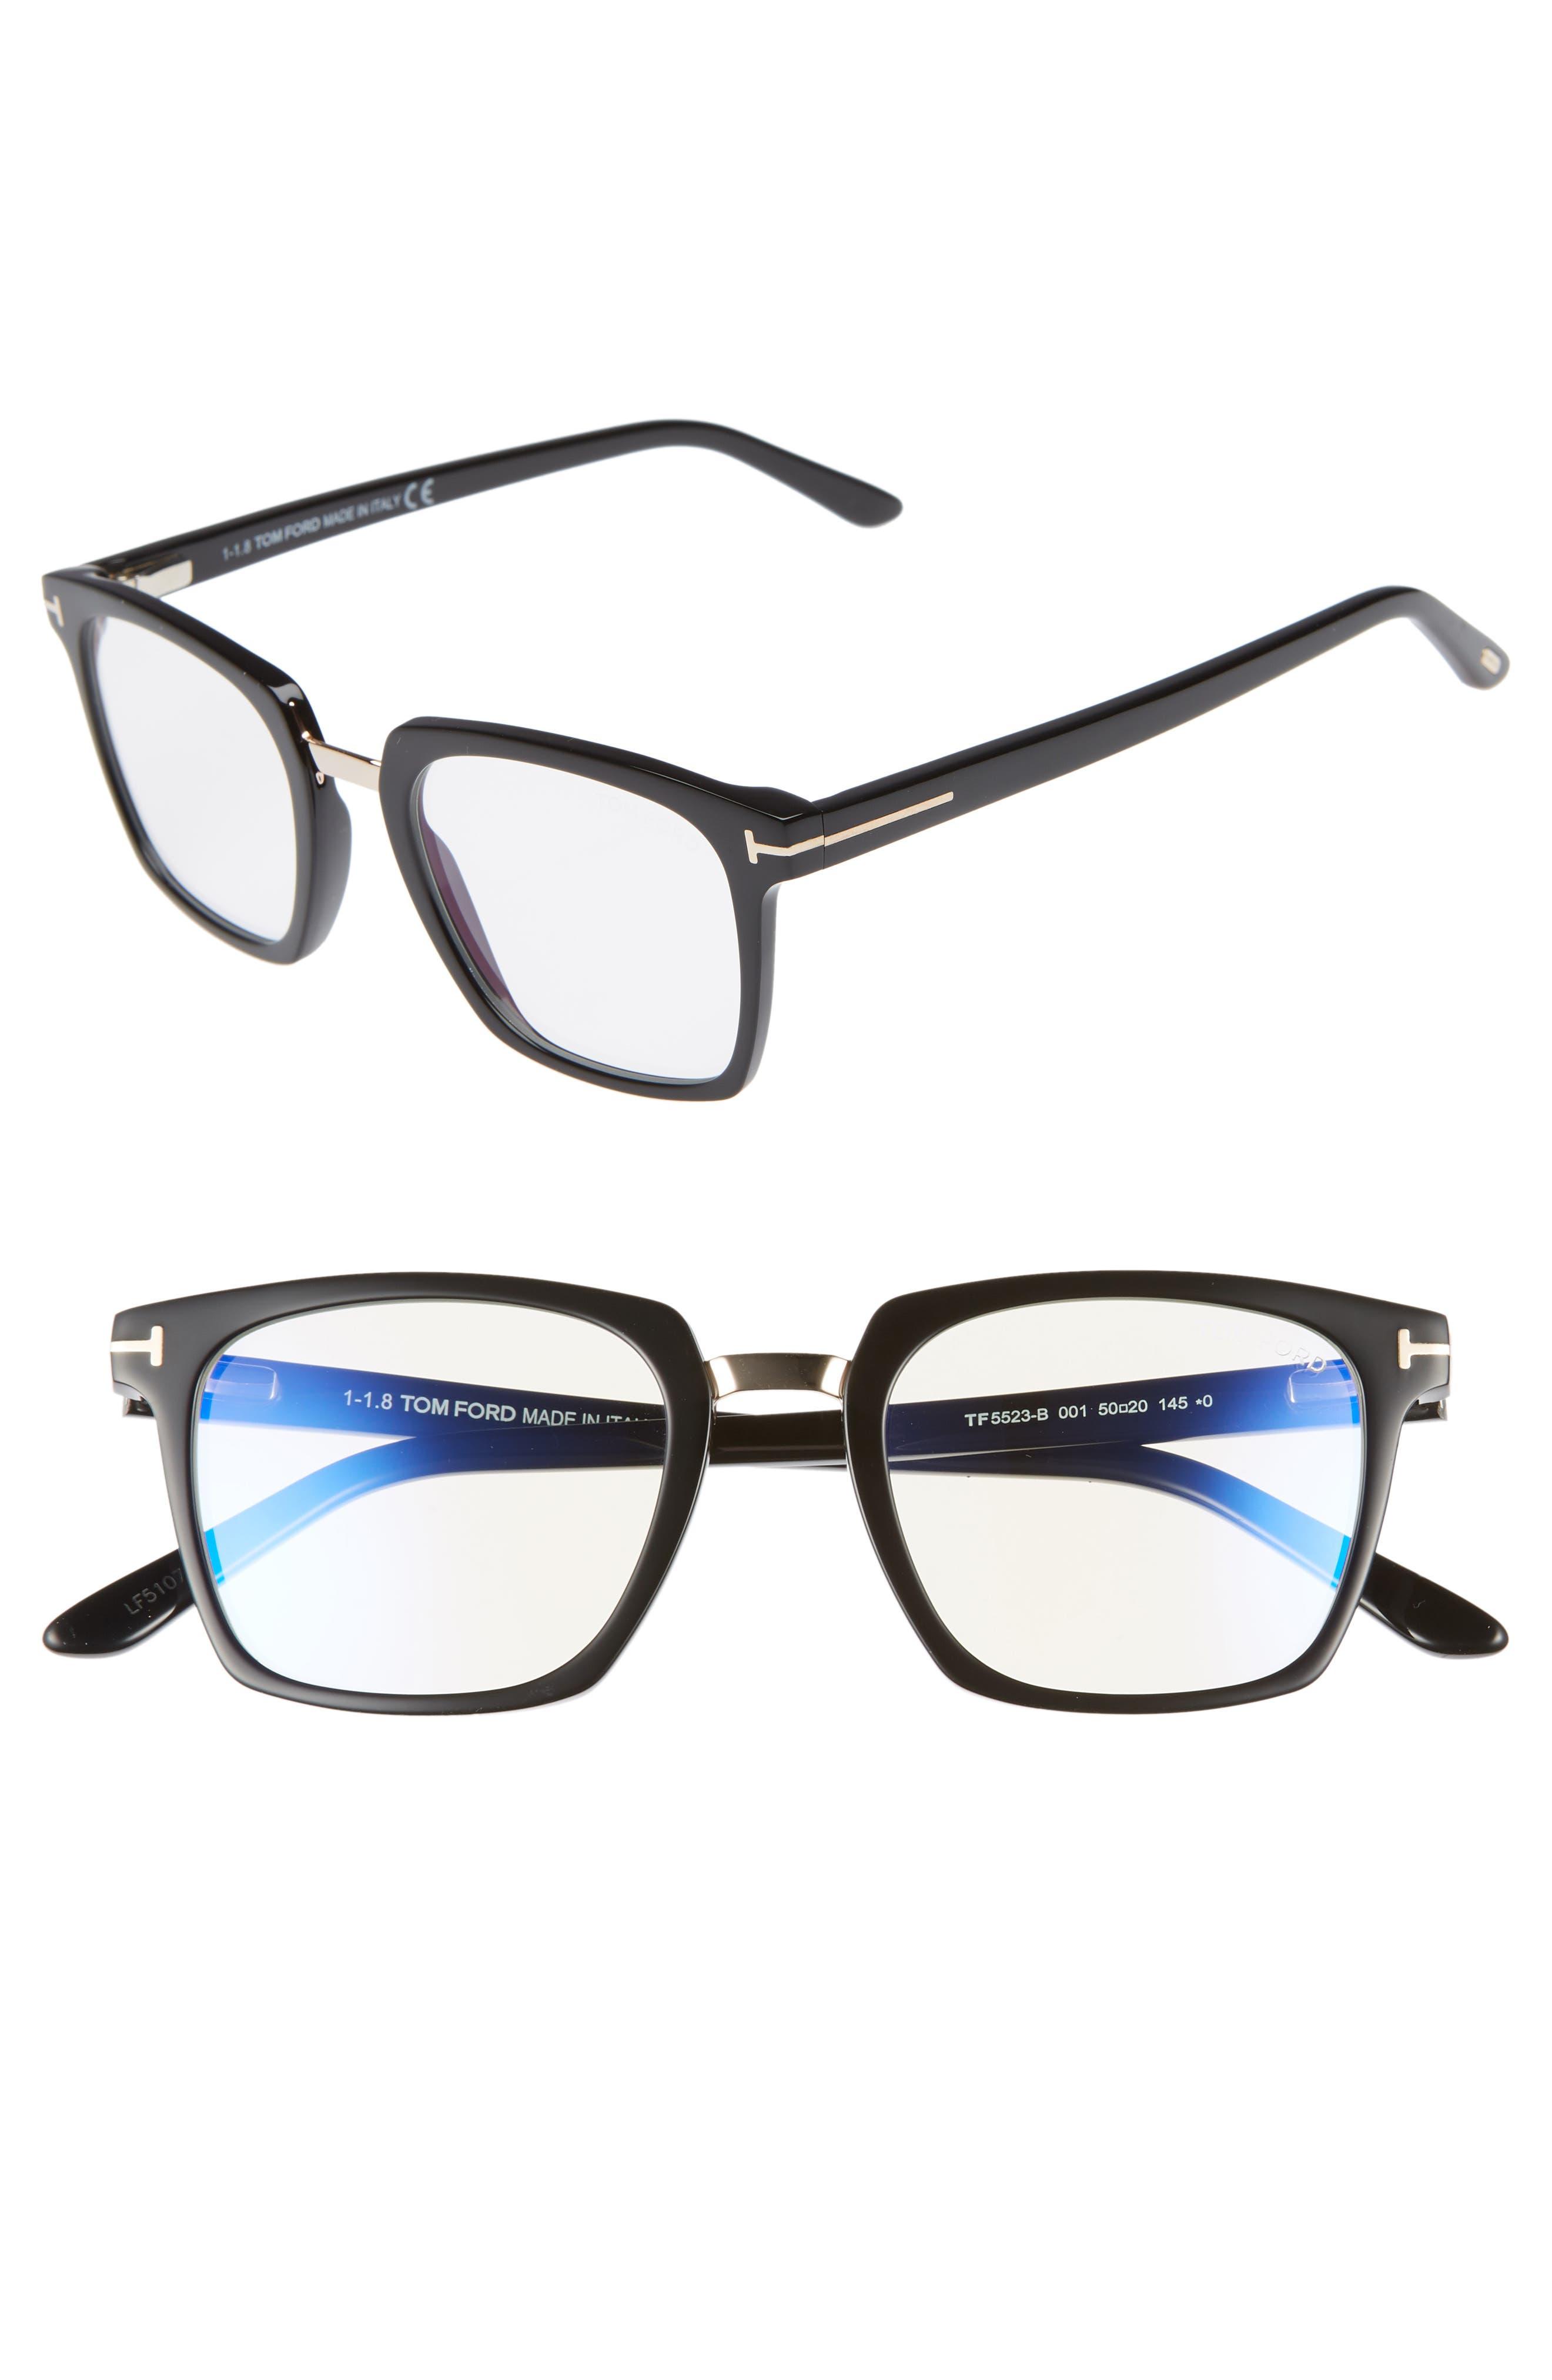 50Mm Blue Block Optical Glasses - Shiny Black